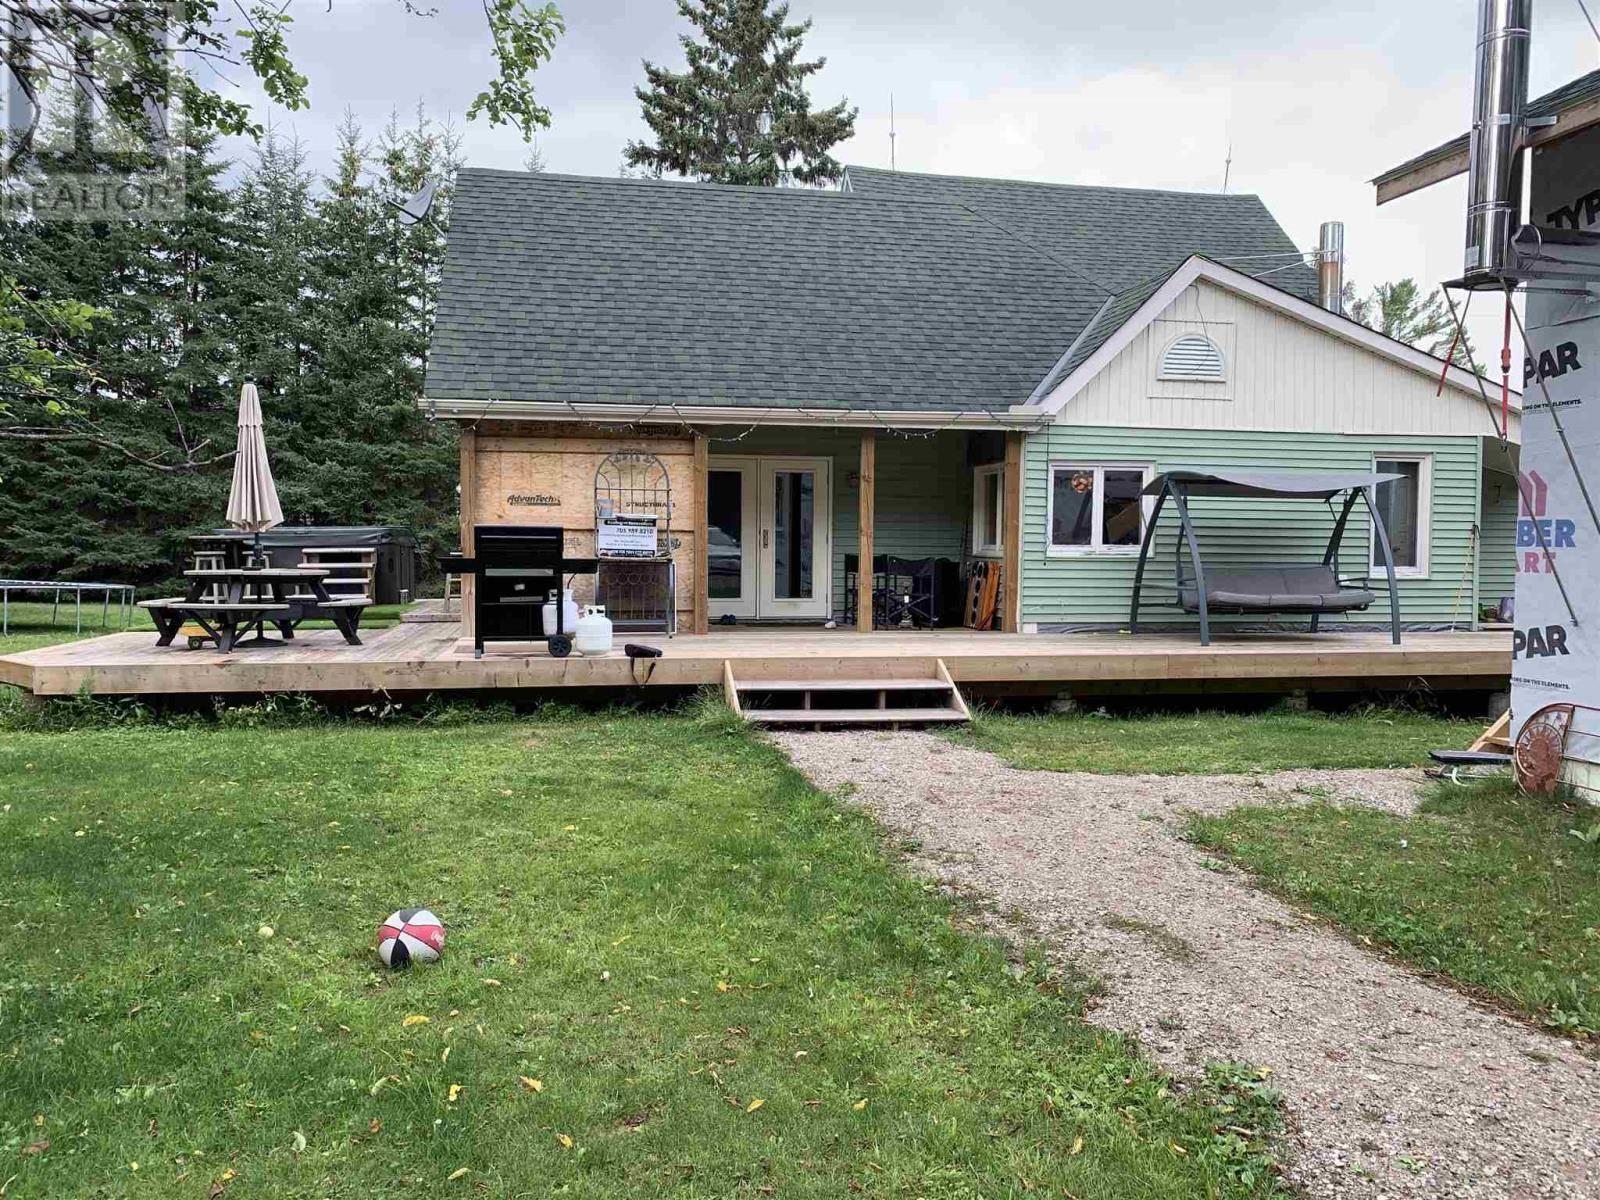 House for sale at 3091 Hilton Rd Hilton Beach Ontario - MLS: SM127445